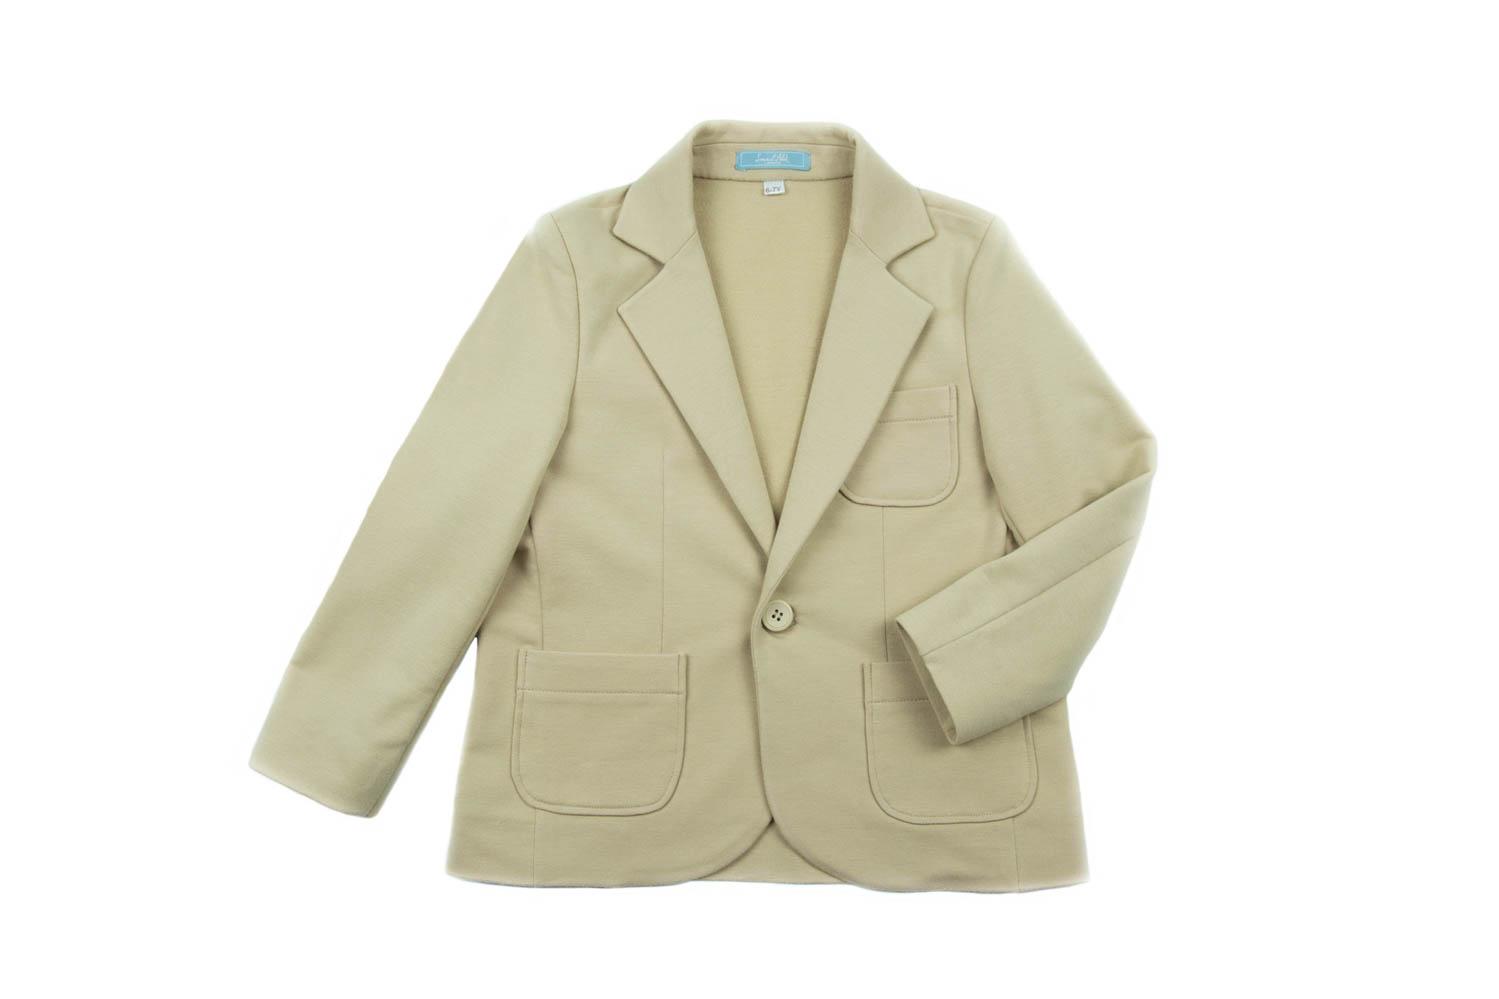 smart_alek-product-jacket-beige-01.jpg